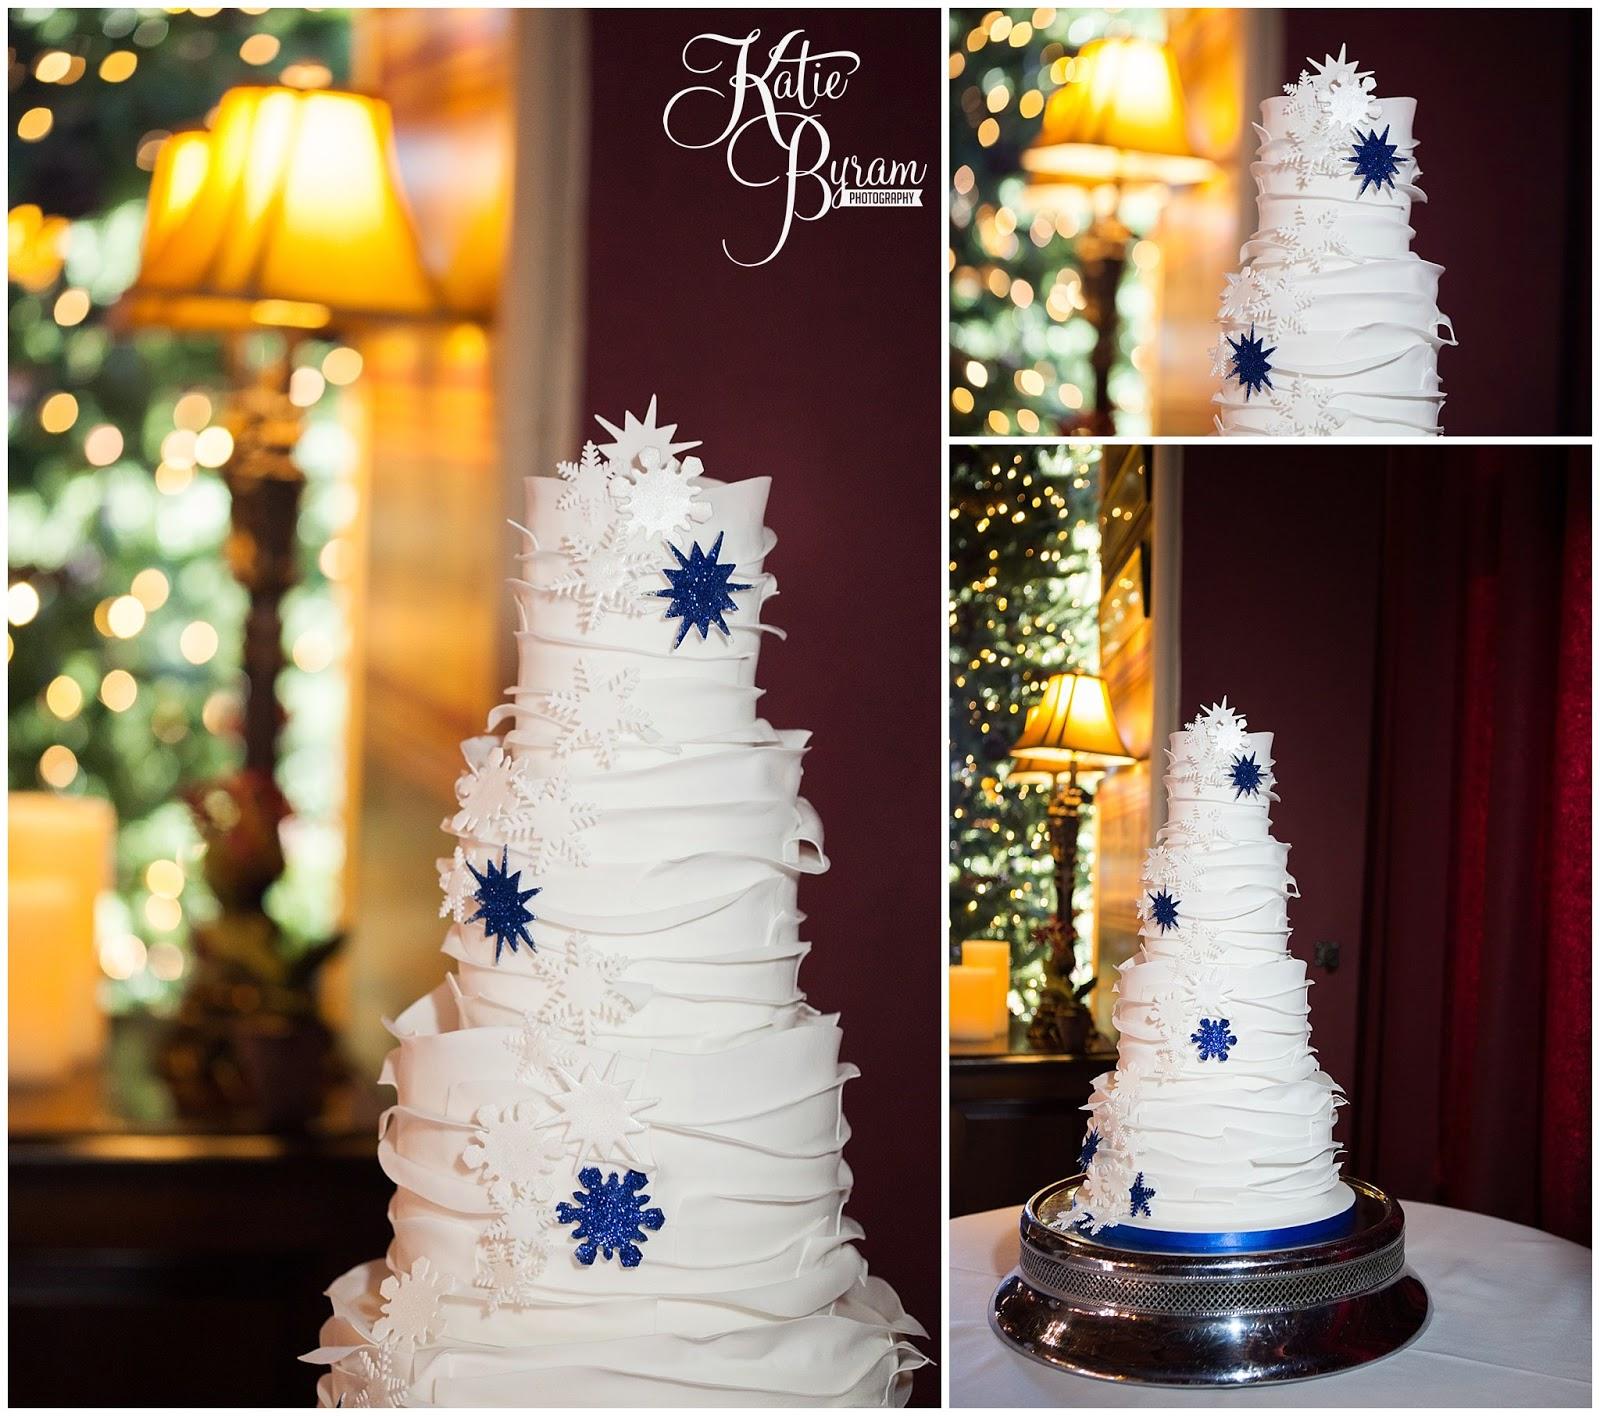 the master cakesmith, wedding cake alnwick, snowflake wedding cake, snowflake cake, winter wedding cake, ,  ellingham hall, ellingham hall wedding, katie byram photography, alnwick treehouse wedding, alnwick garden wedding, alnwick wedding,